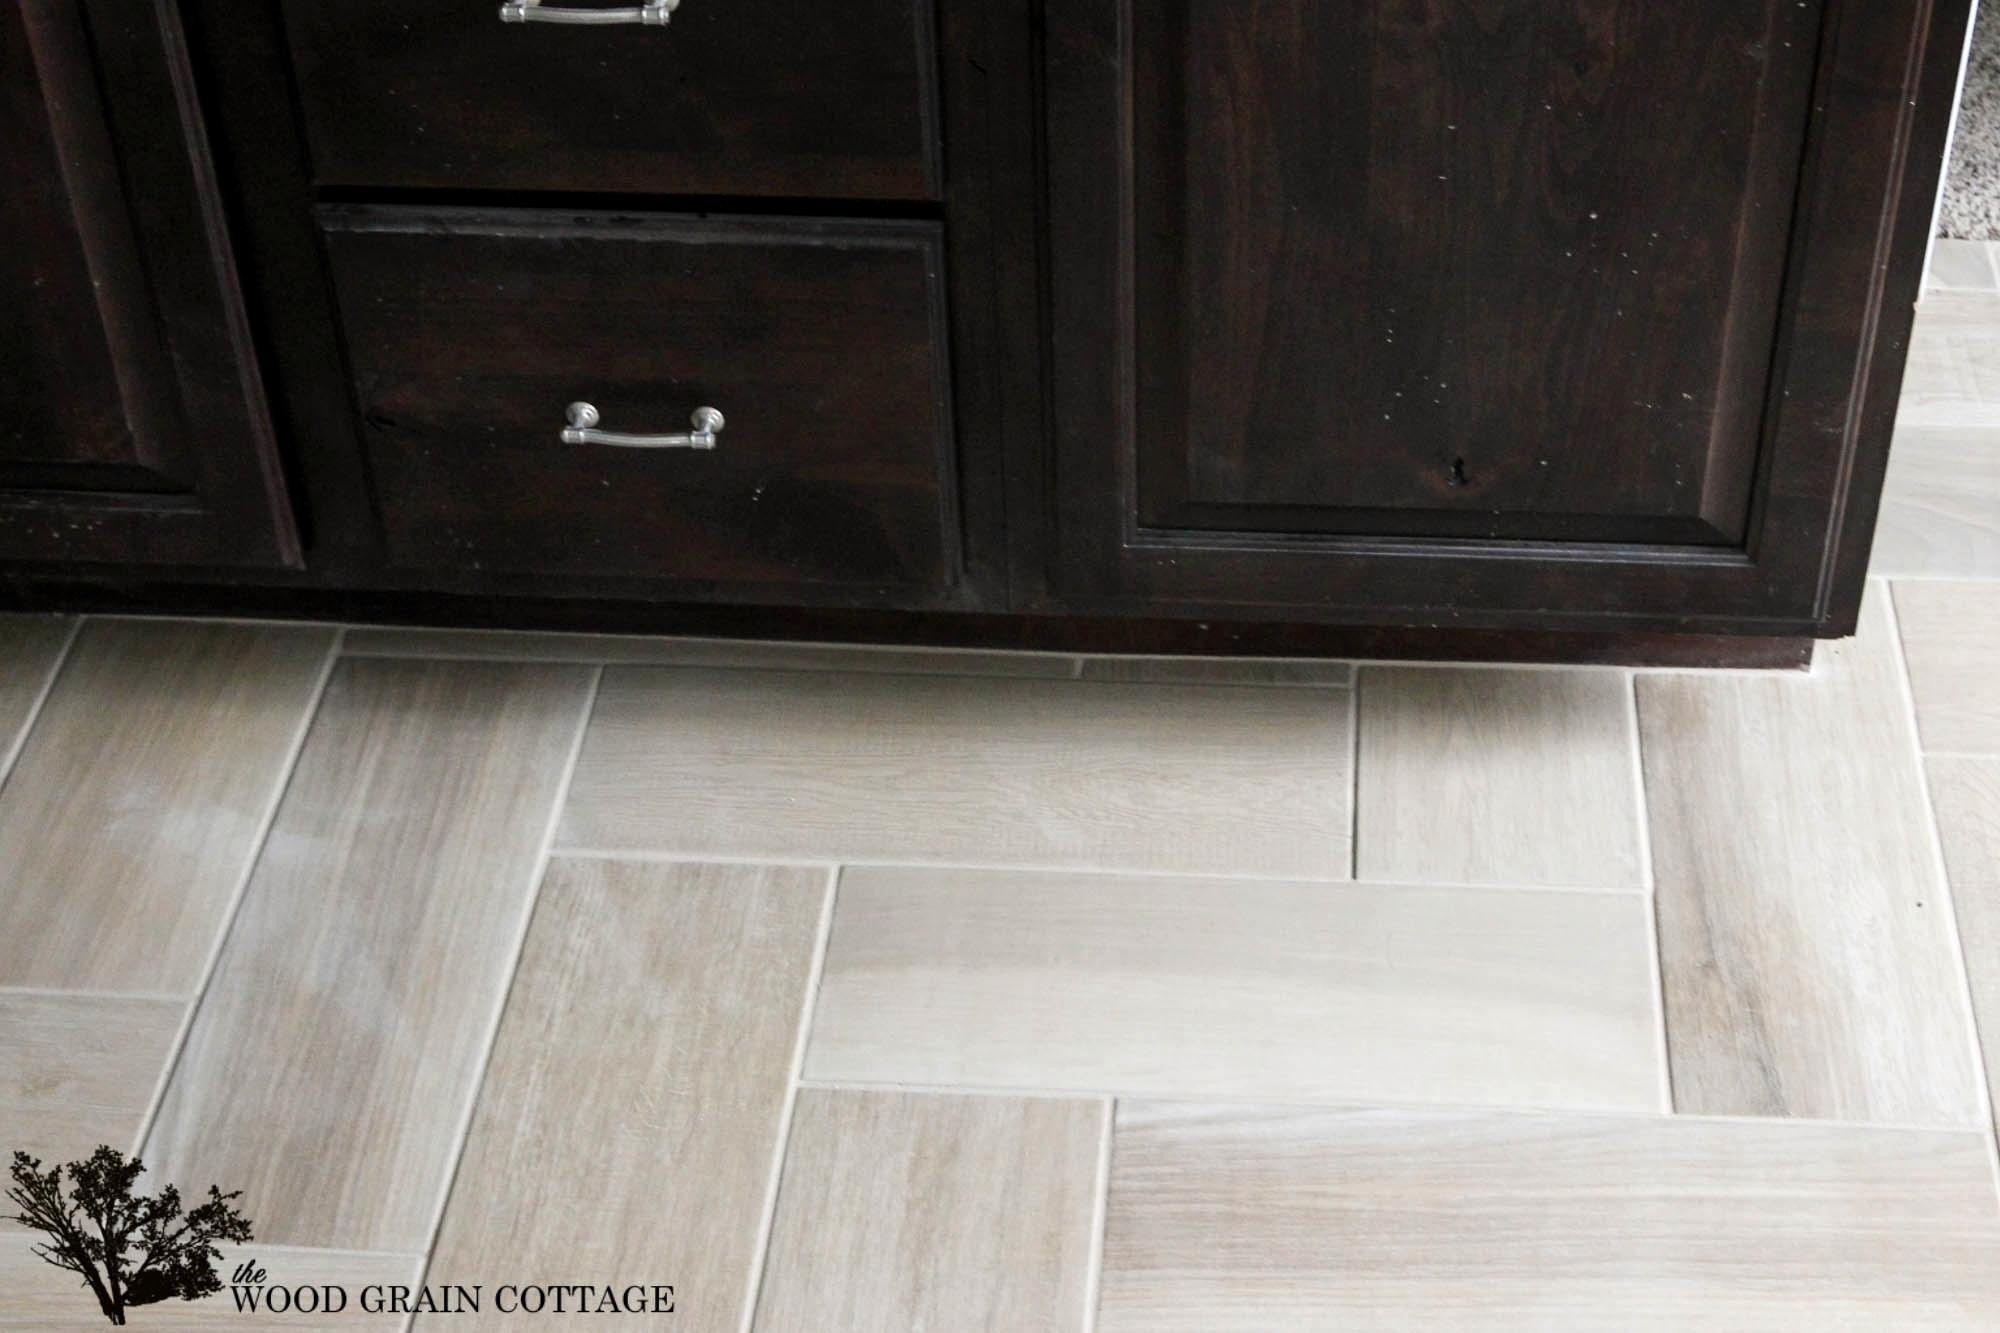 how to transition hardwood floor to tile of cute wood look bathroom tiles within floor transition laminate to in cute wood look bathroom tiles within floor transition laminate to herringbone tile pattern